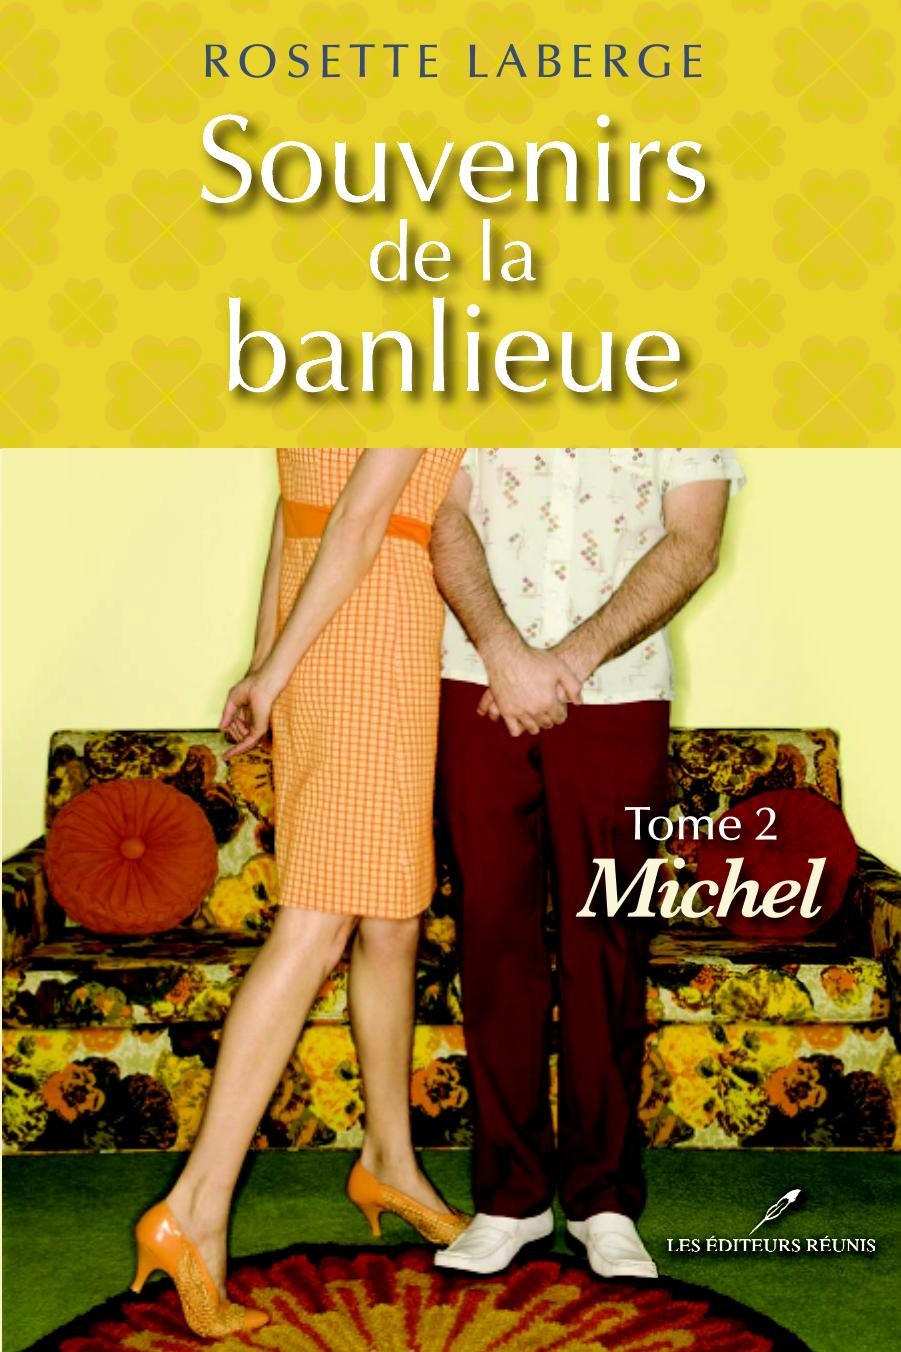 Souvenirs de la banlieue 2 : Michel